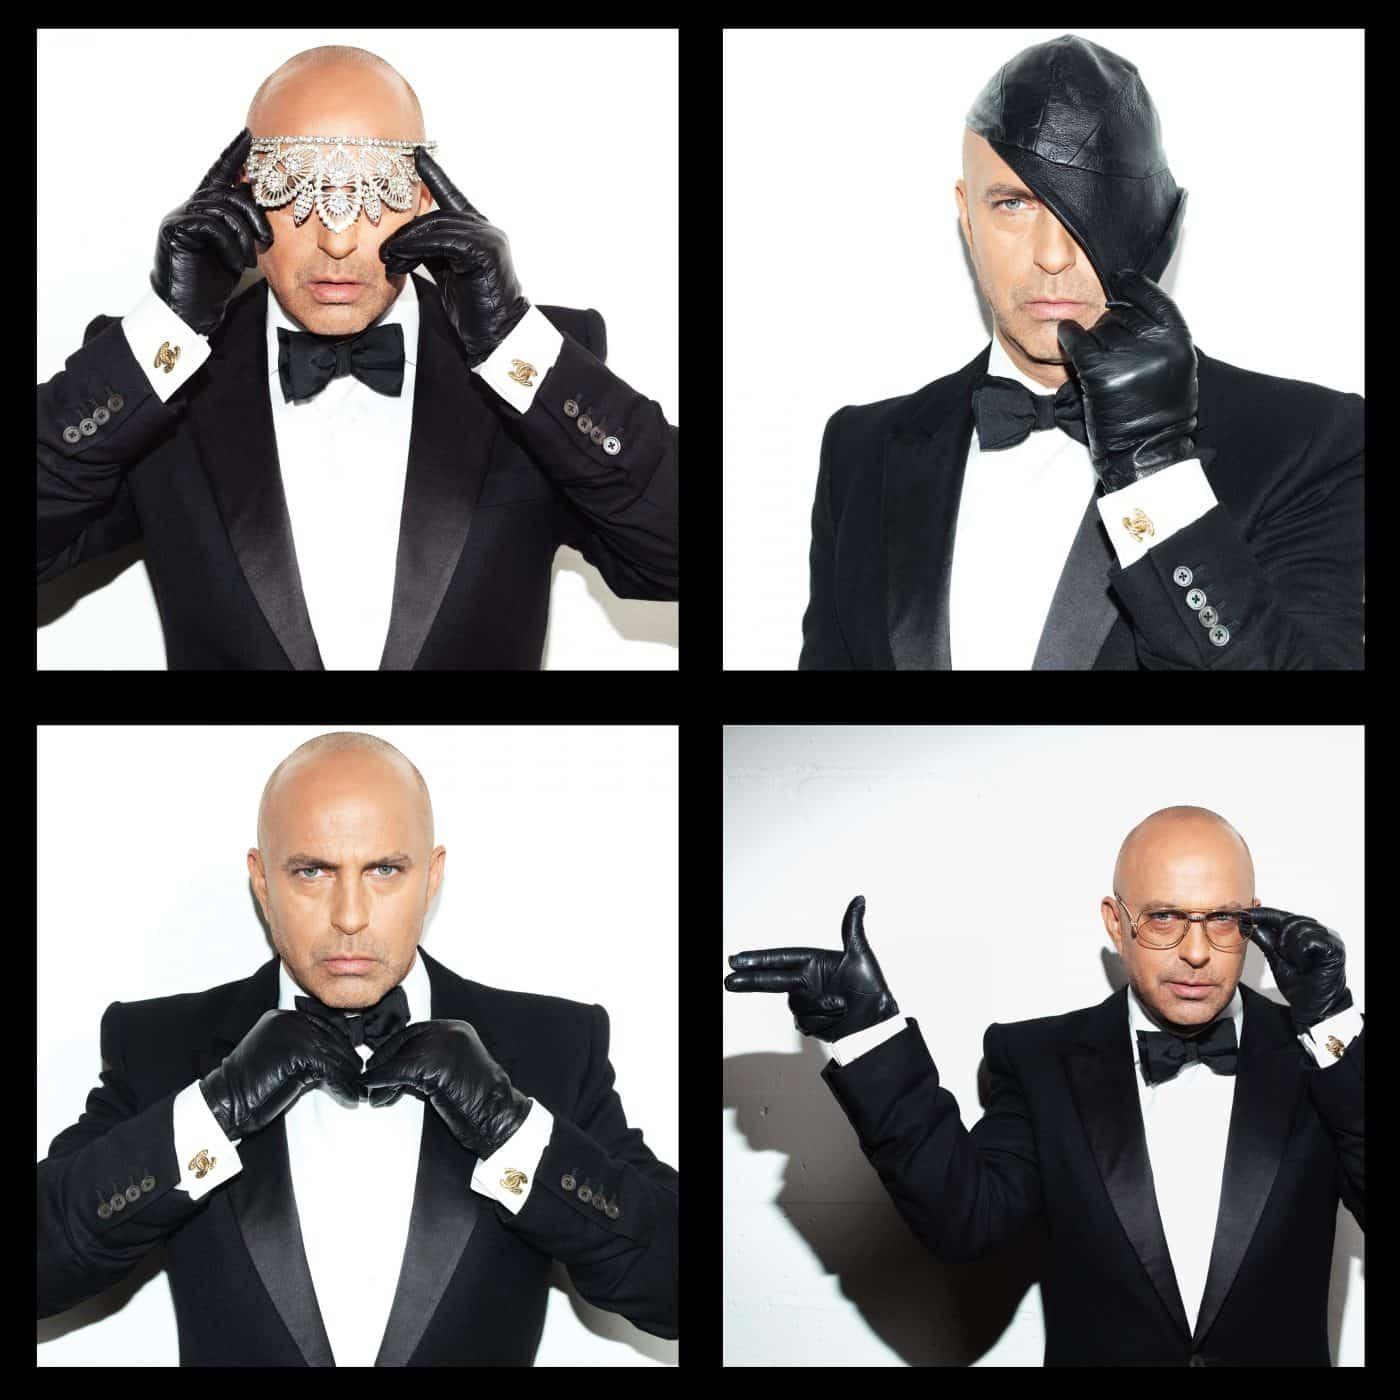 Tony Tiemeyer, owner of vintage-fashion studio Evolution, dressed in an ALEXANDER MCQUEEN tux and designer accessories